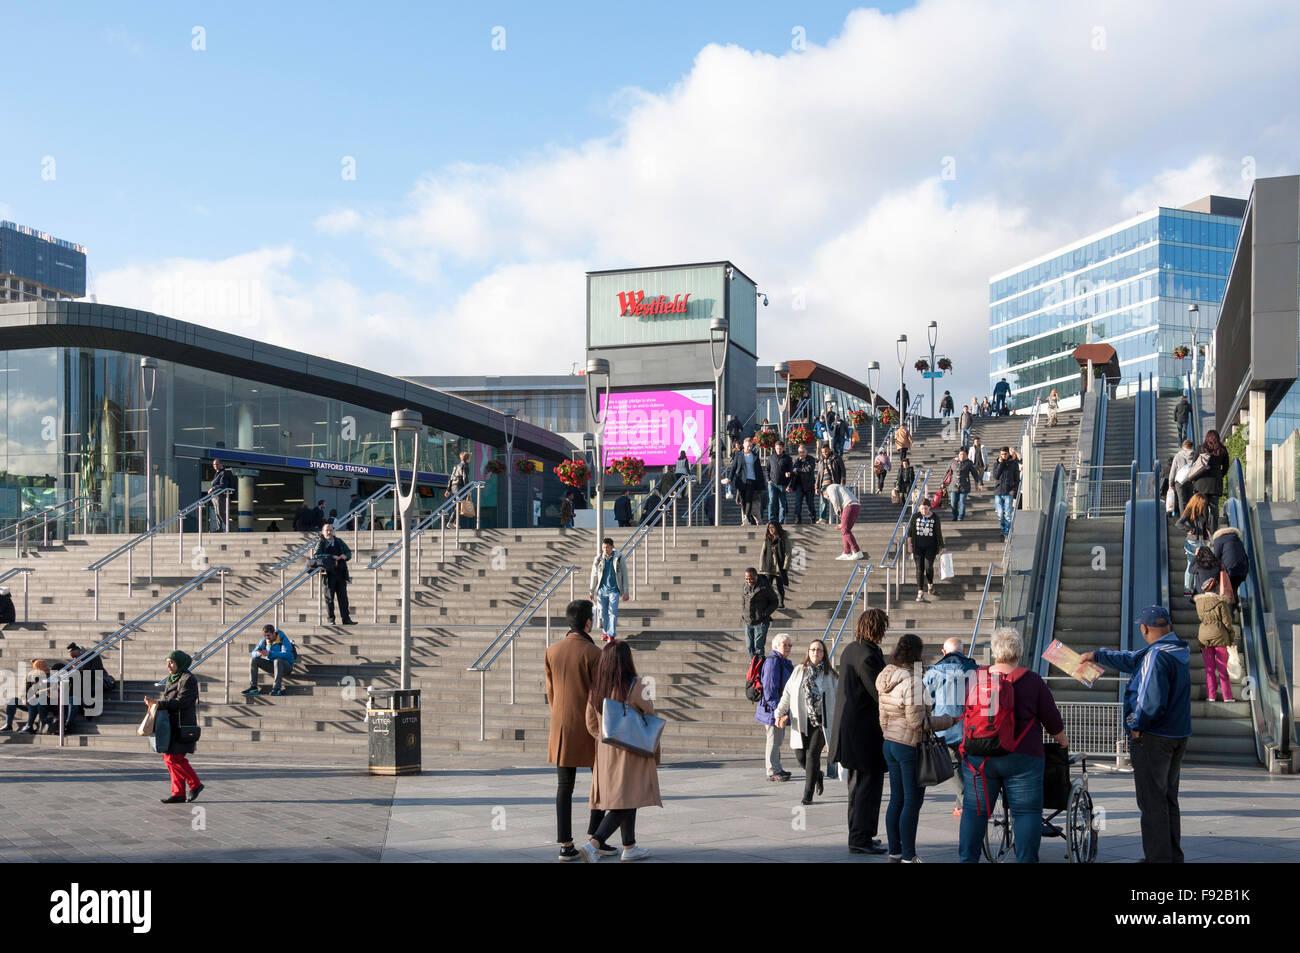 Bridge to Westfield Shopping Centre, Stratford, Newham Borough, Greater London, England, United Kingdom Stock Photo